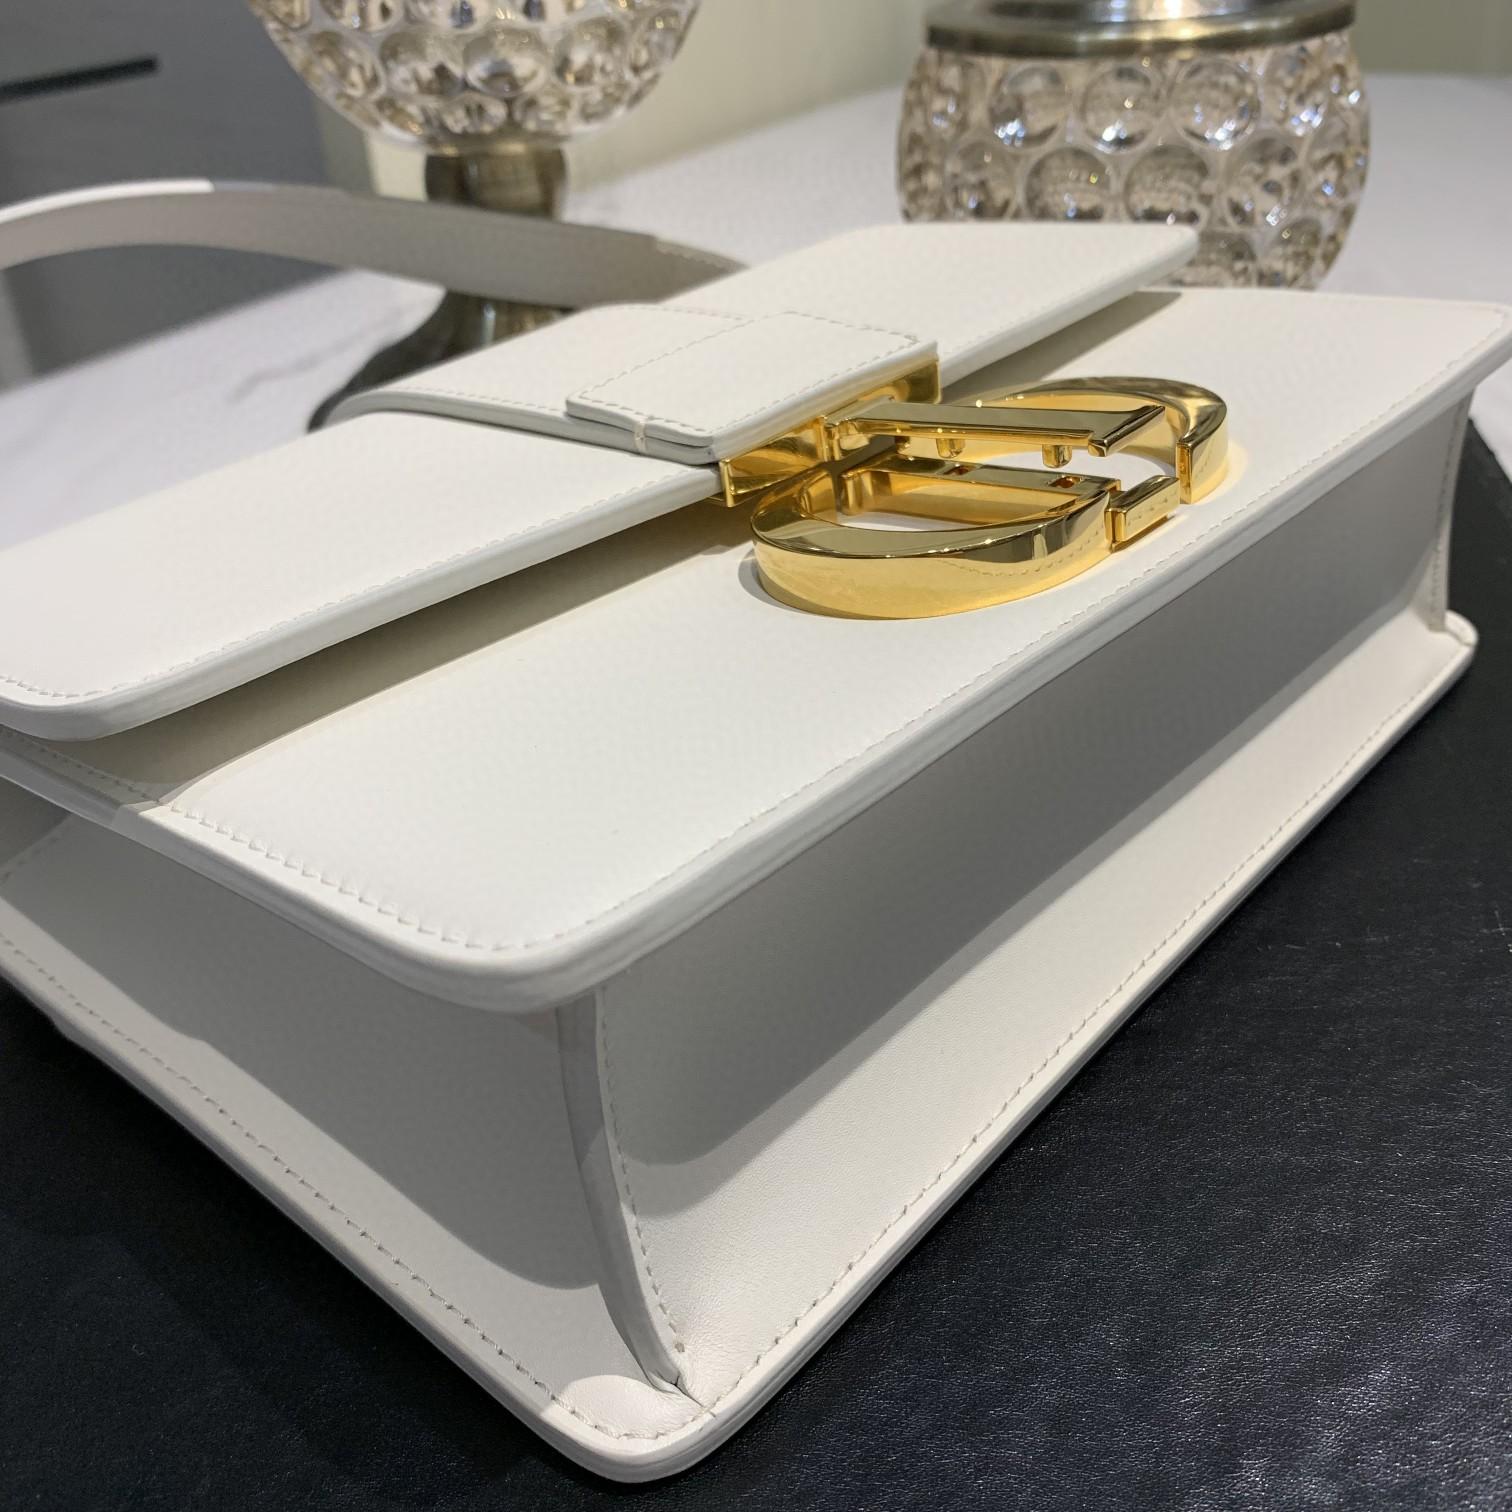 #Montaigne30#原工厂白色胎牛皮 24cm 纯铜五金表面电镀24k金 德国亚曼粗蜡线 每一个针孔都有特色花型